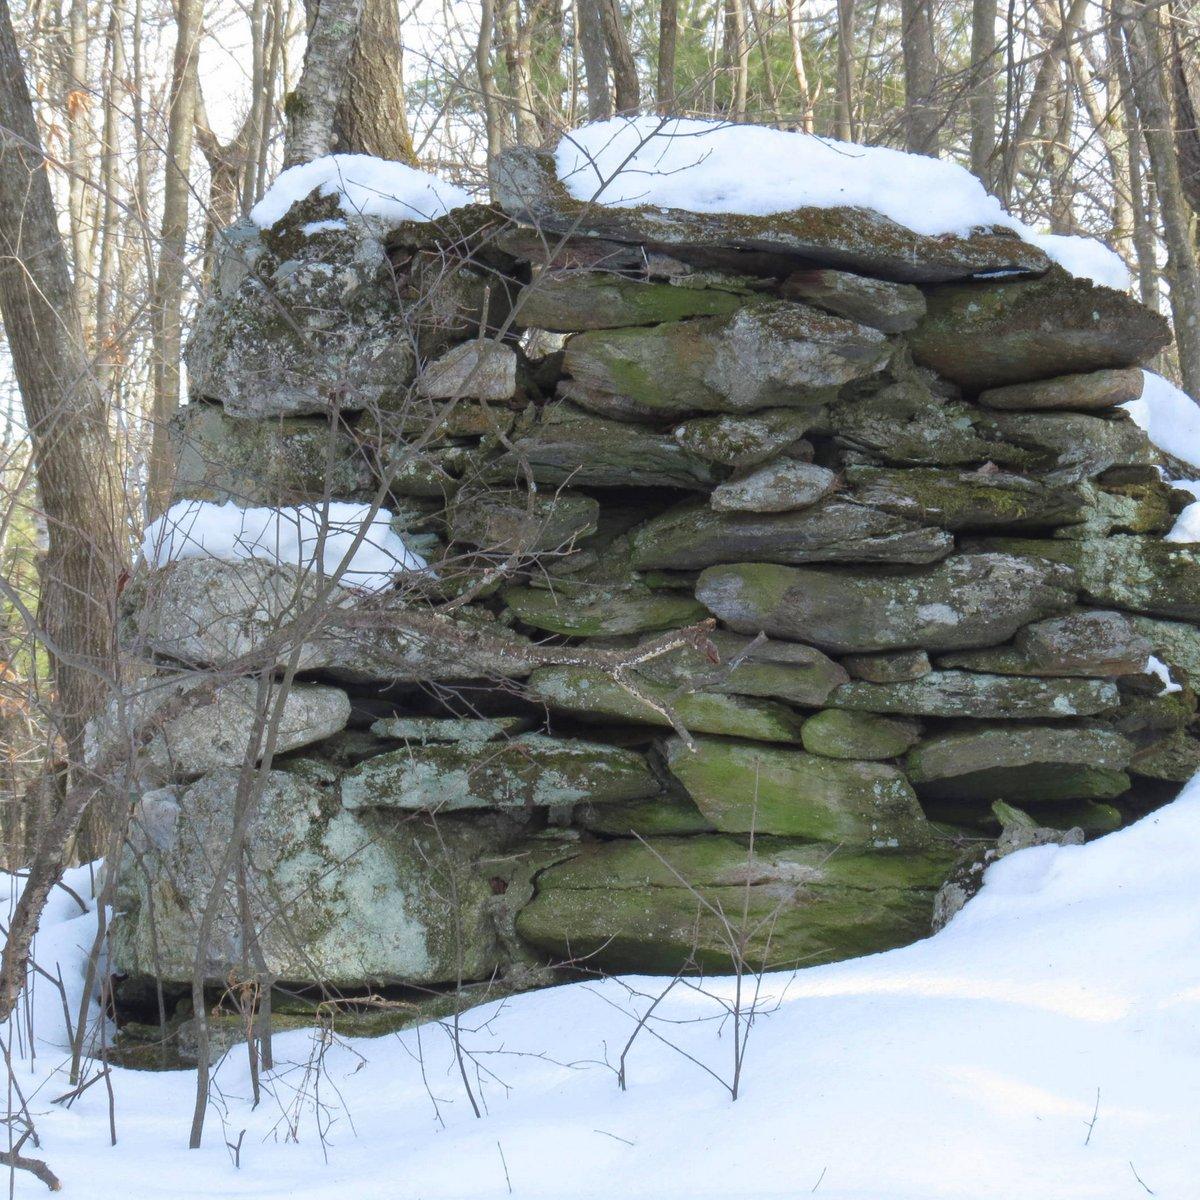 10. Stone Foundation Ruins